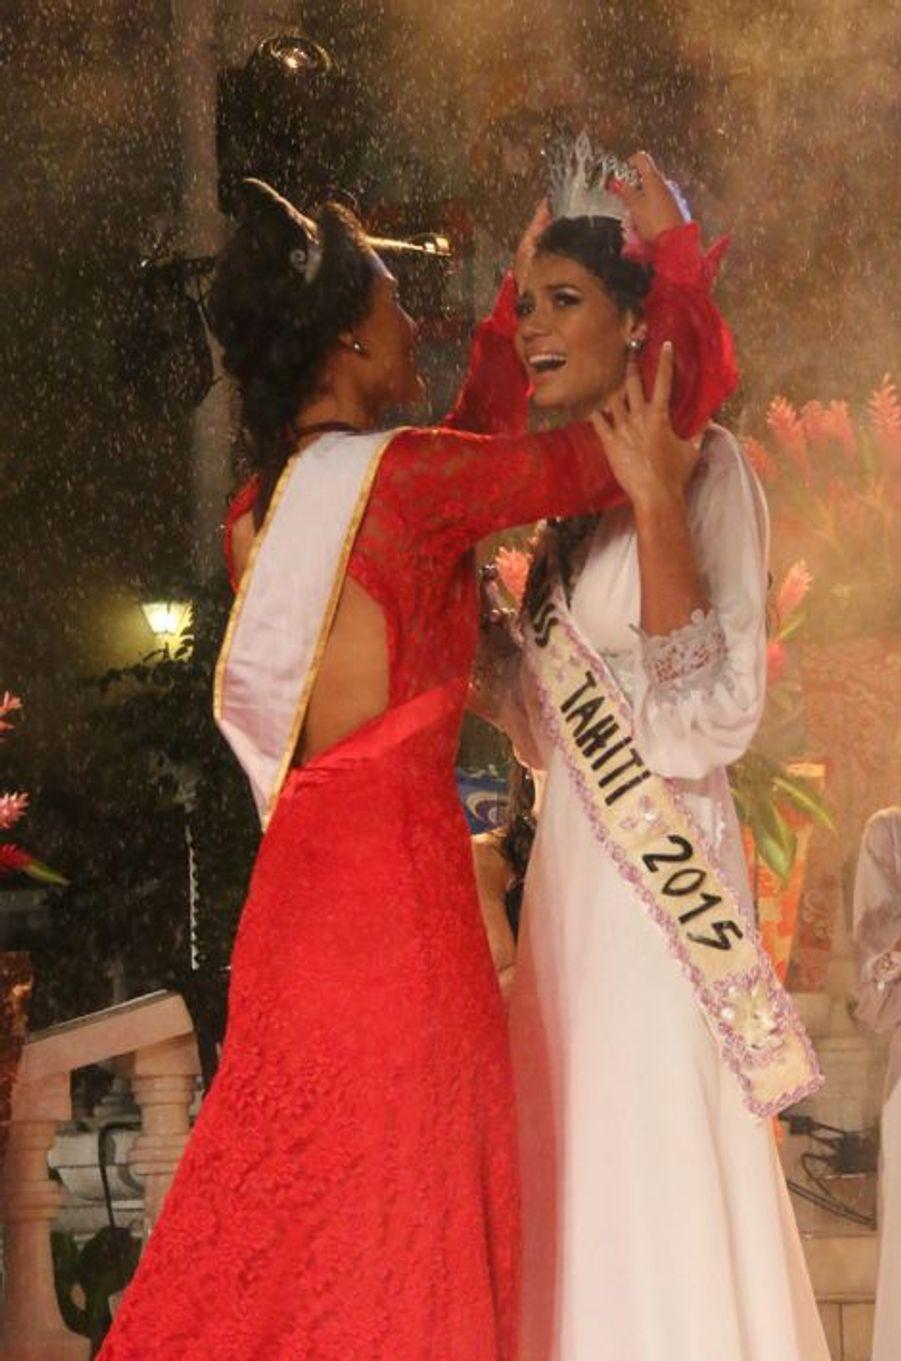 Le sacre de Vaimiti Teiefitu couronnée Miss Tahiti 2015